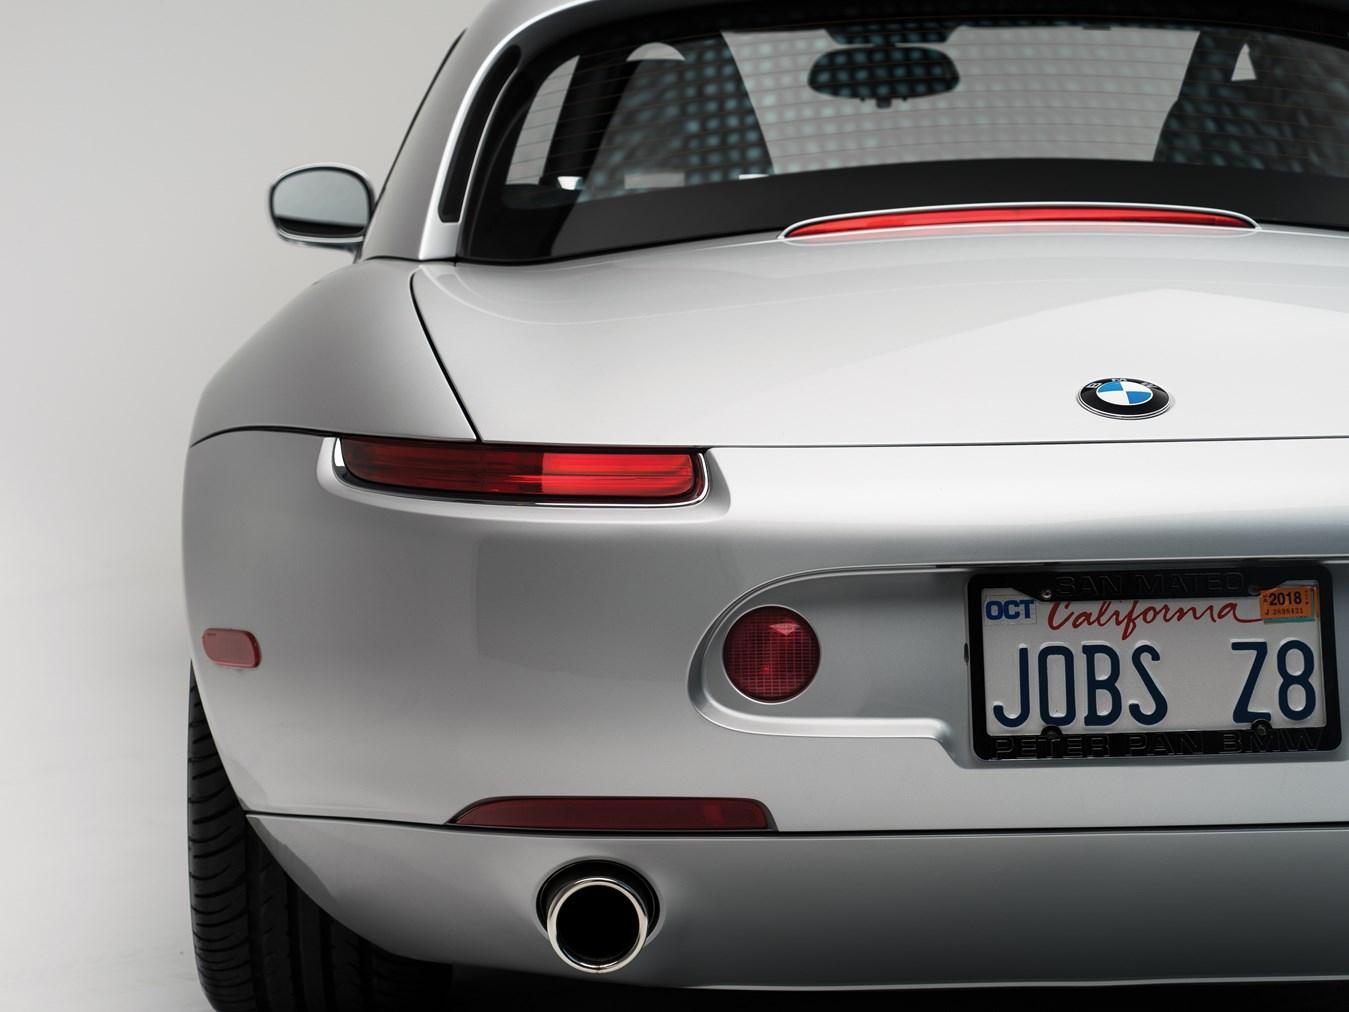 Steve Jobs BMW